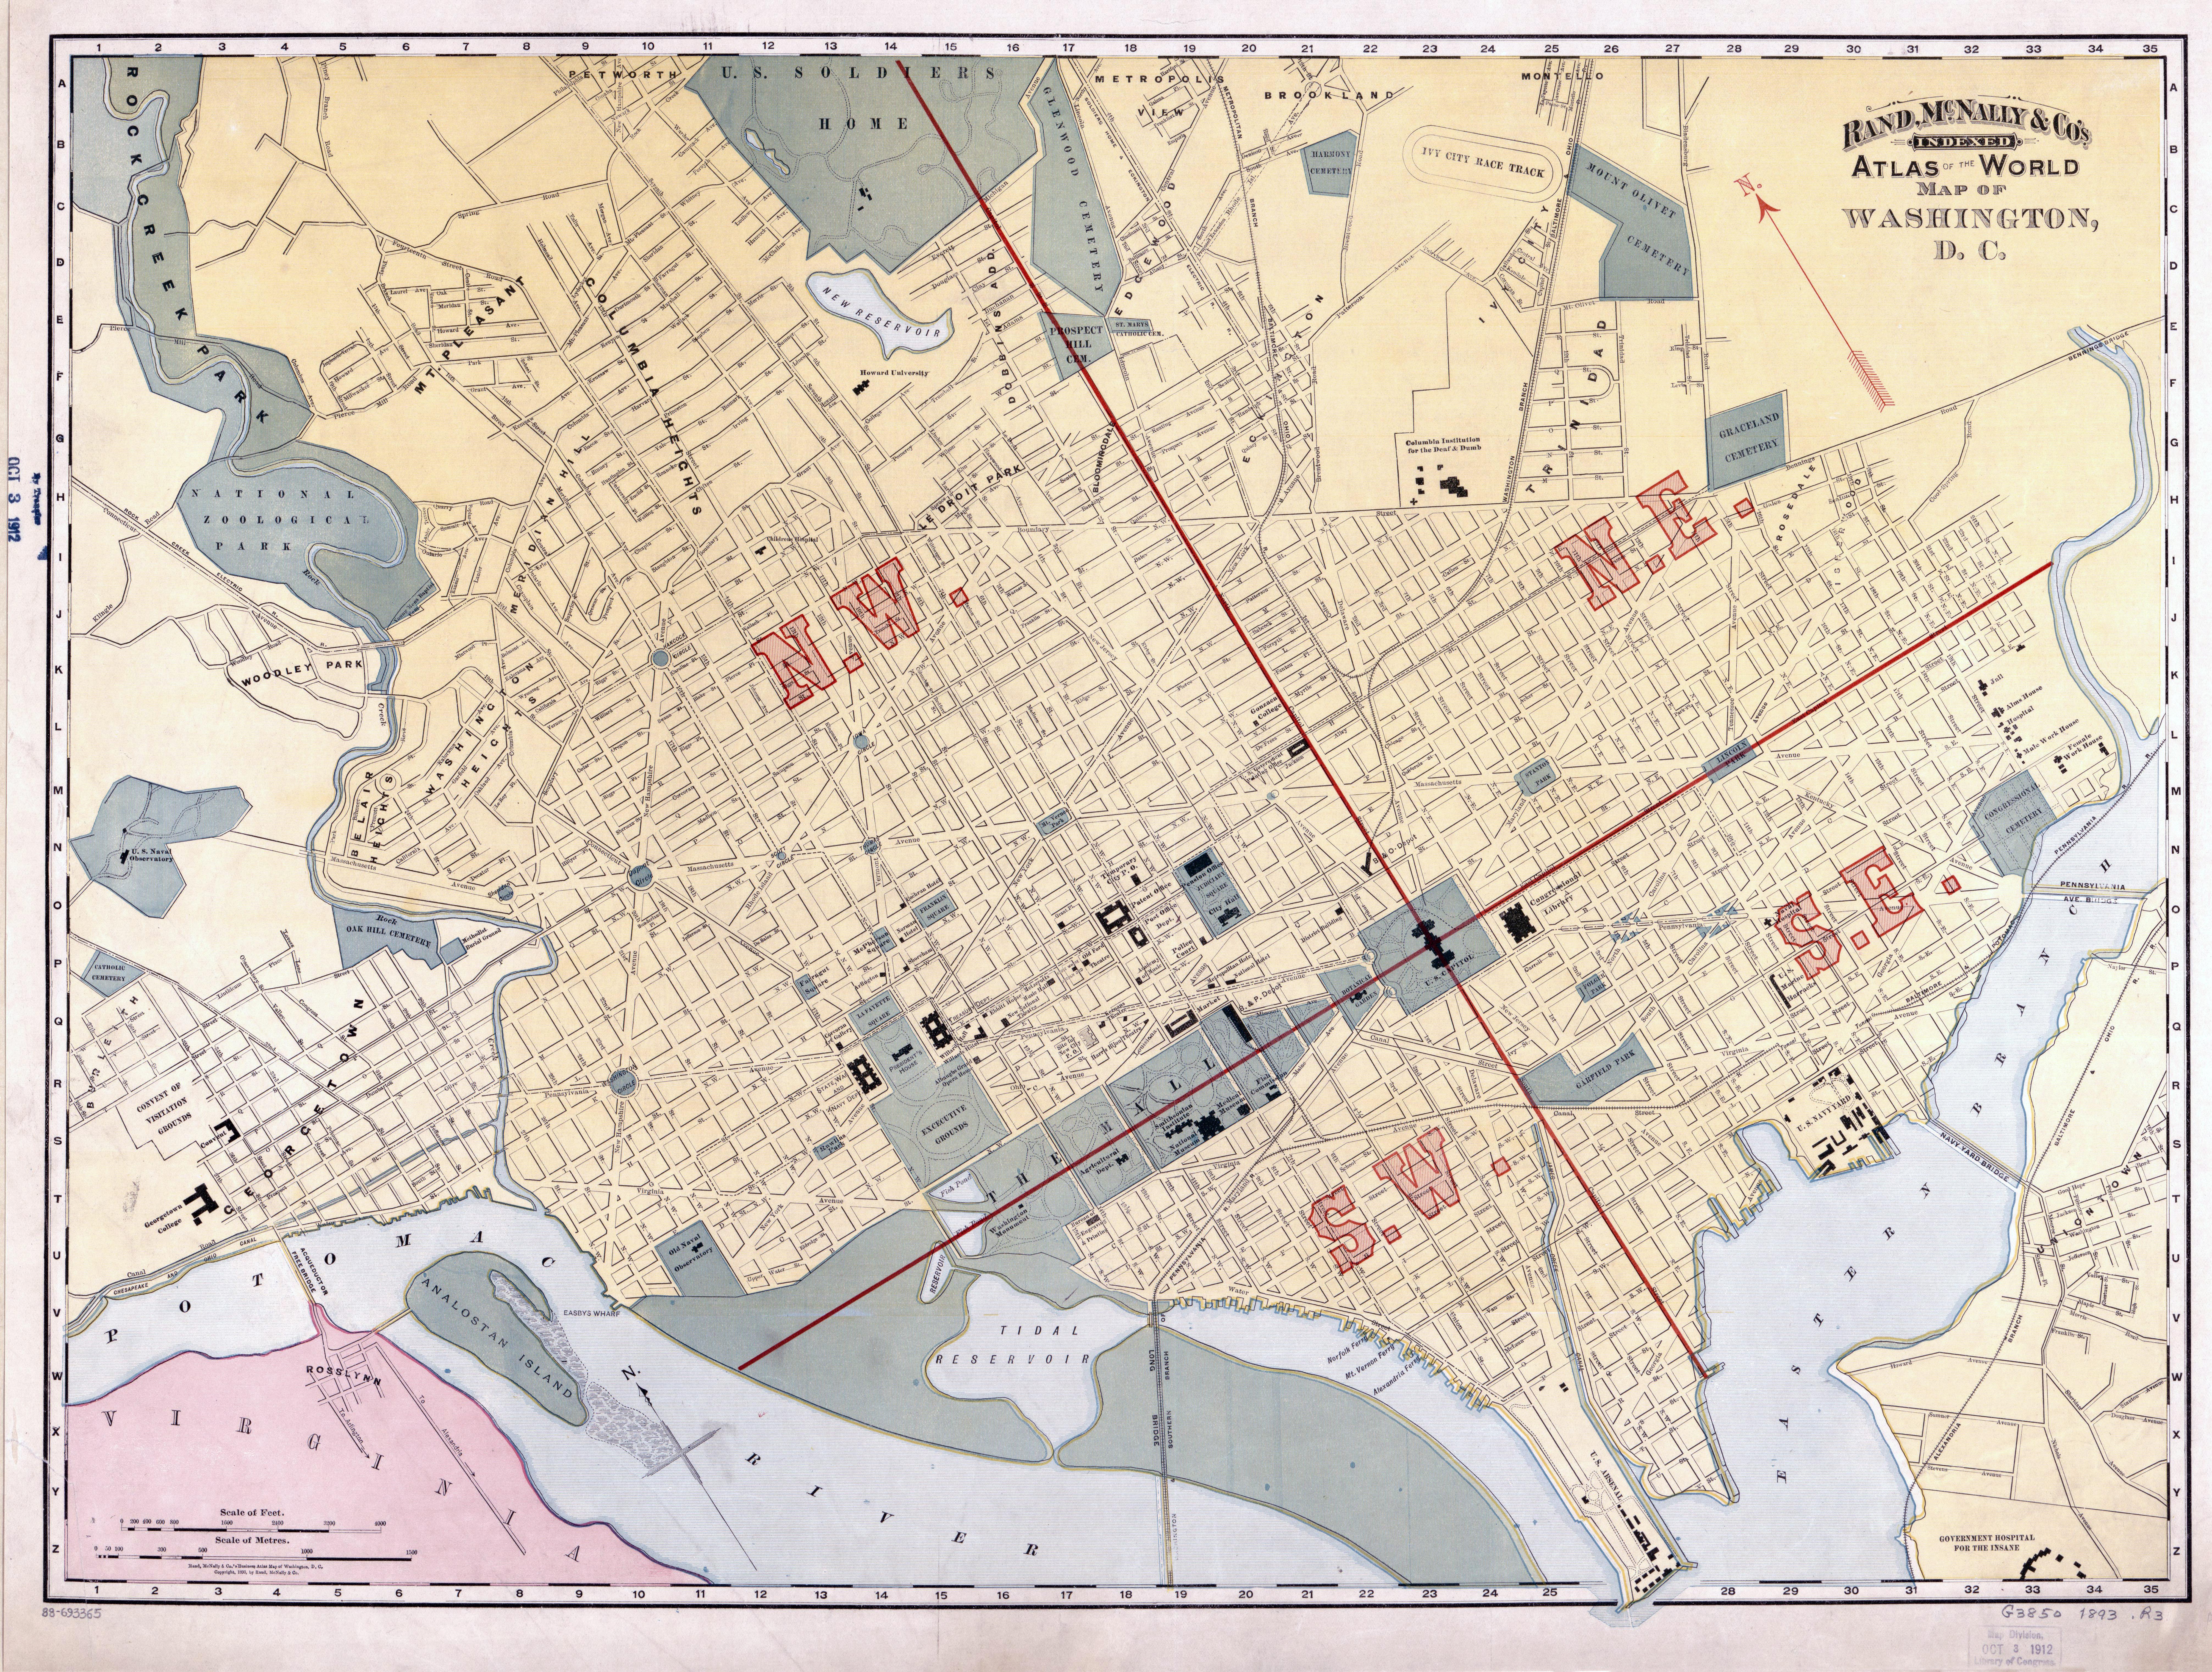 Large scale old Rand McNally Co map of Washington DC 1893